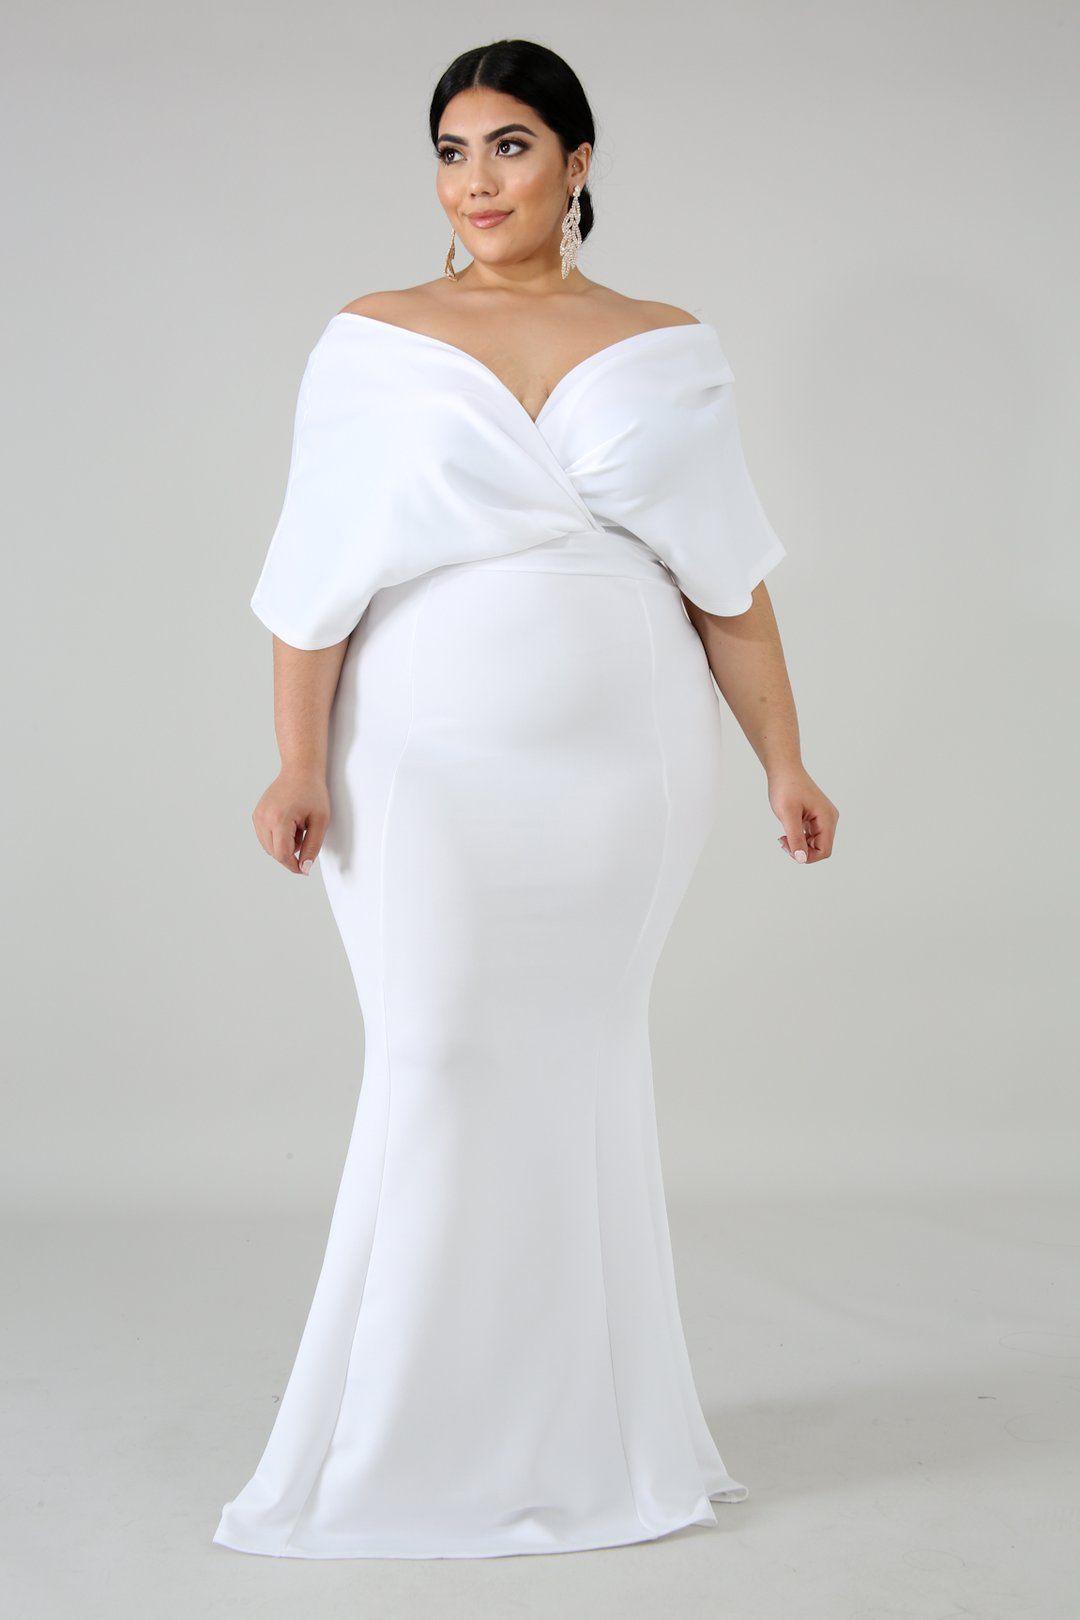 Elegance Glam Maxi Dress Style Gt1318pdescriptionthis Elegance Glam Maxi Dress Features A Stretchy Fabric Off S Elegant White Dress Glam Maxi Dress Dresses [ 1620 x 1080 Pixel ]